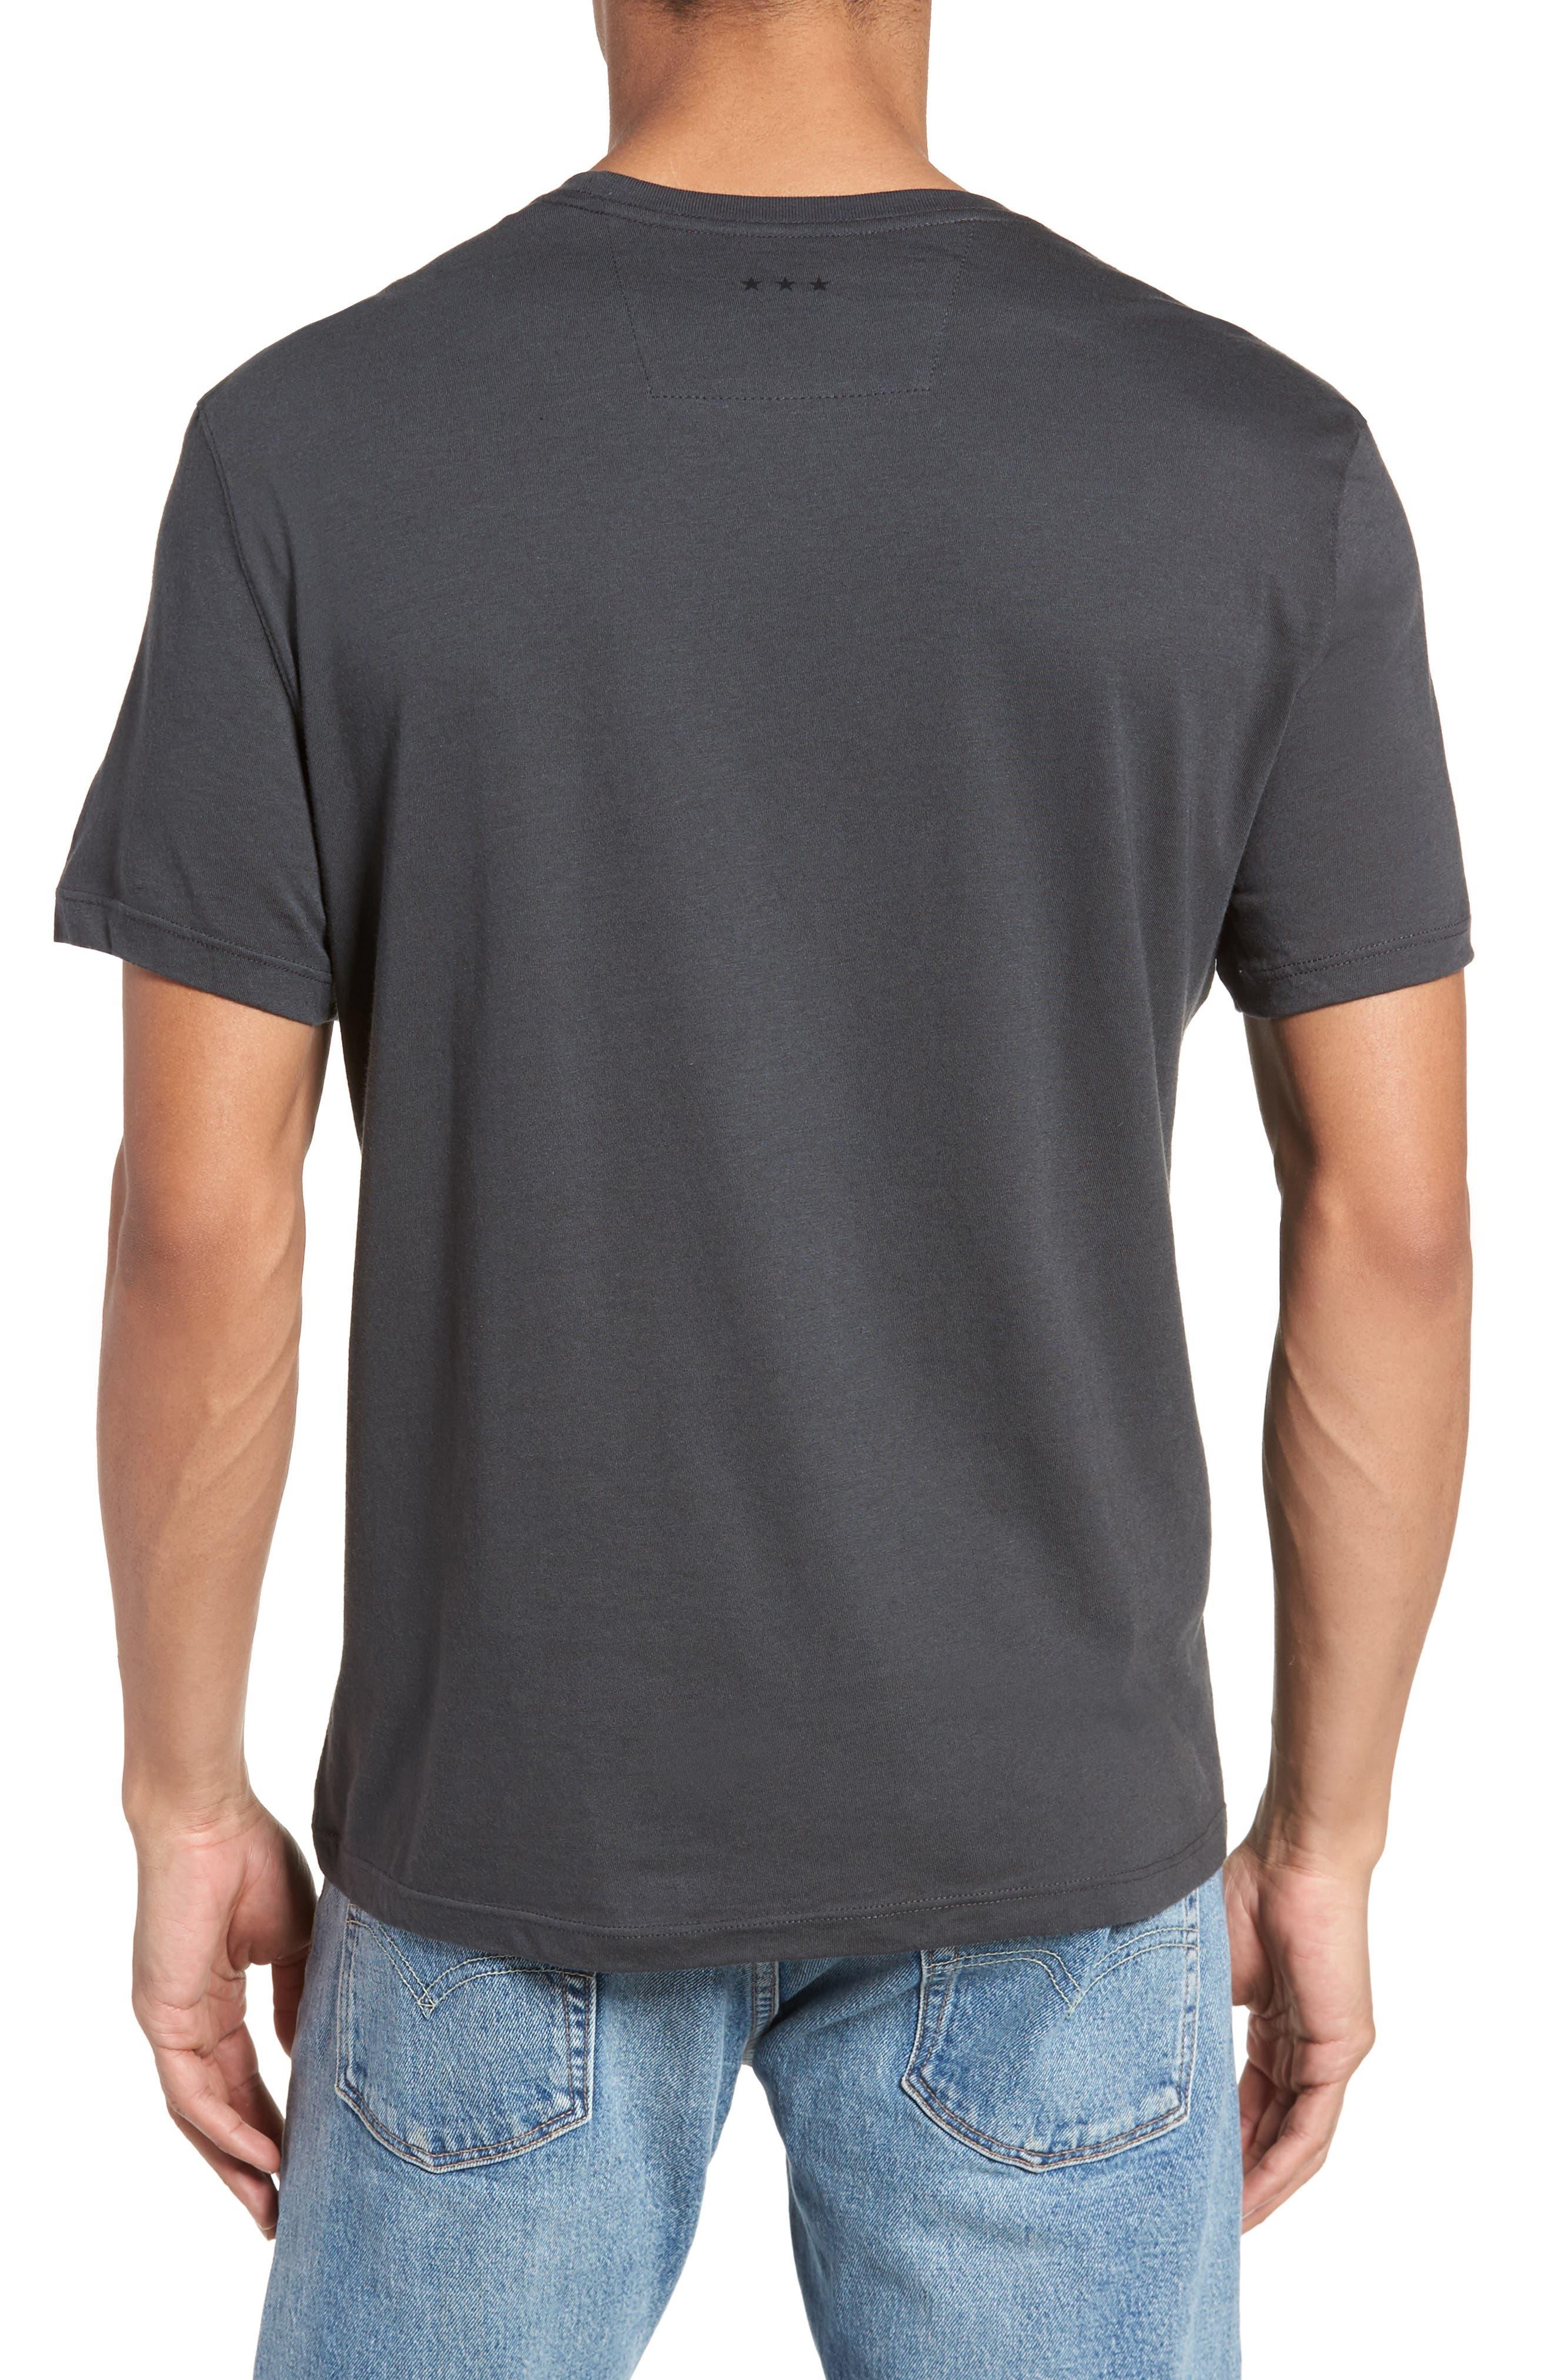 Guns N' Roses Graphic T-Shirt,                             Alternate thumbnail 2, color,                             Coal